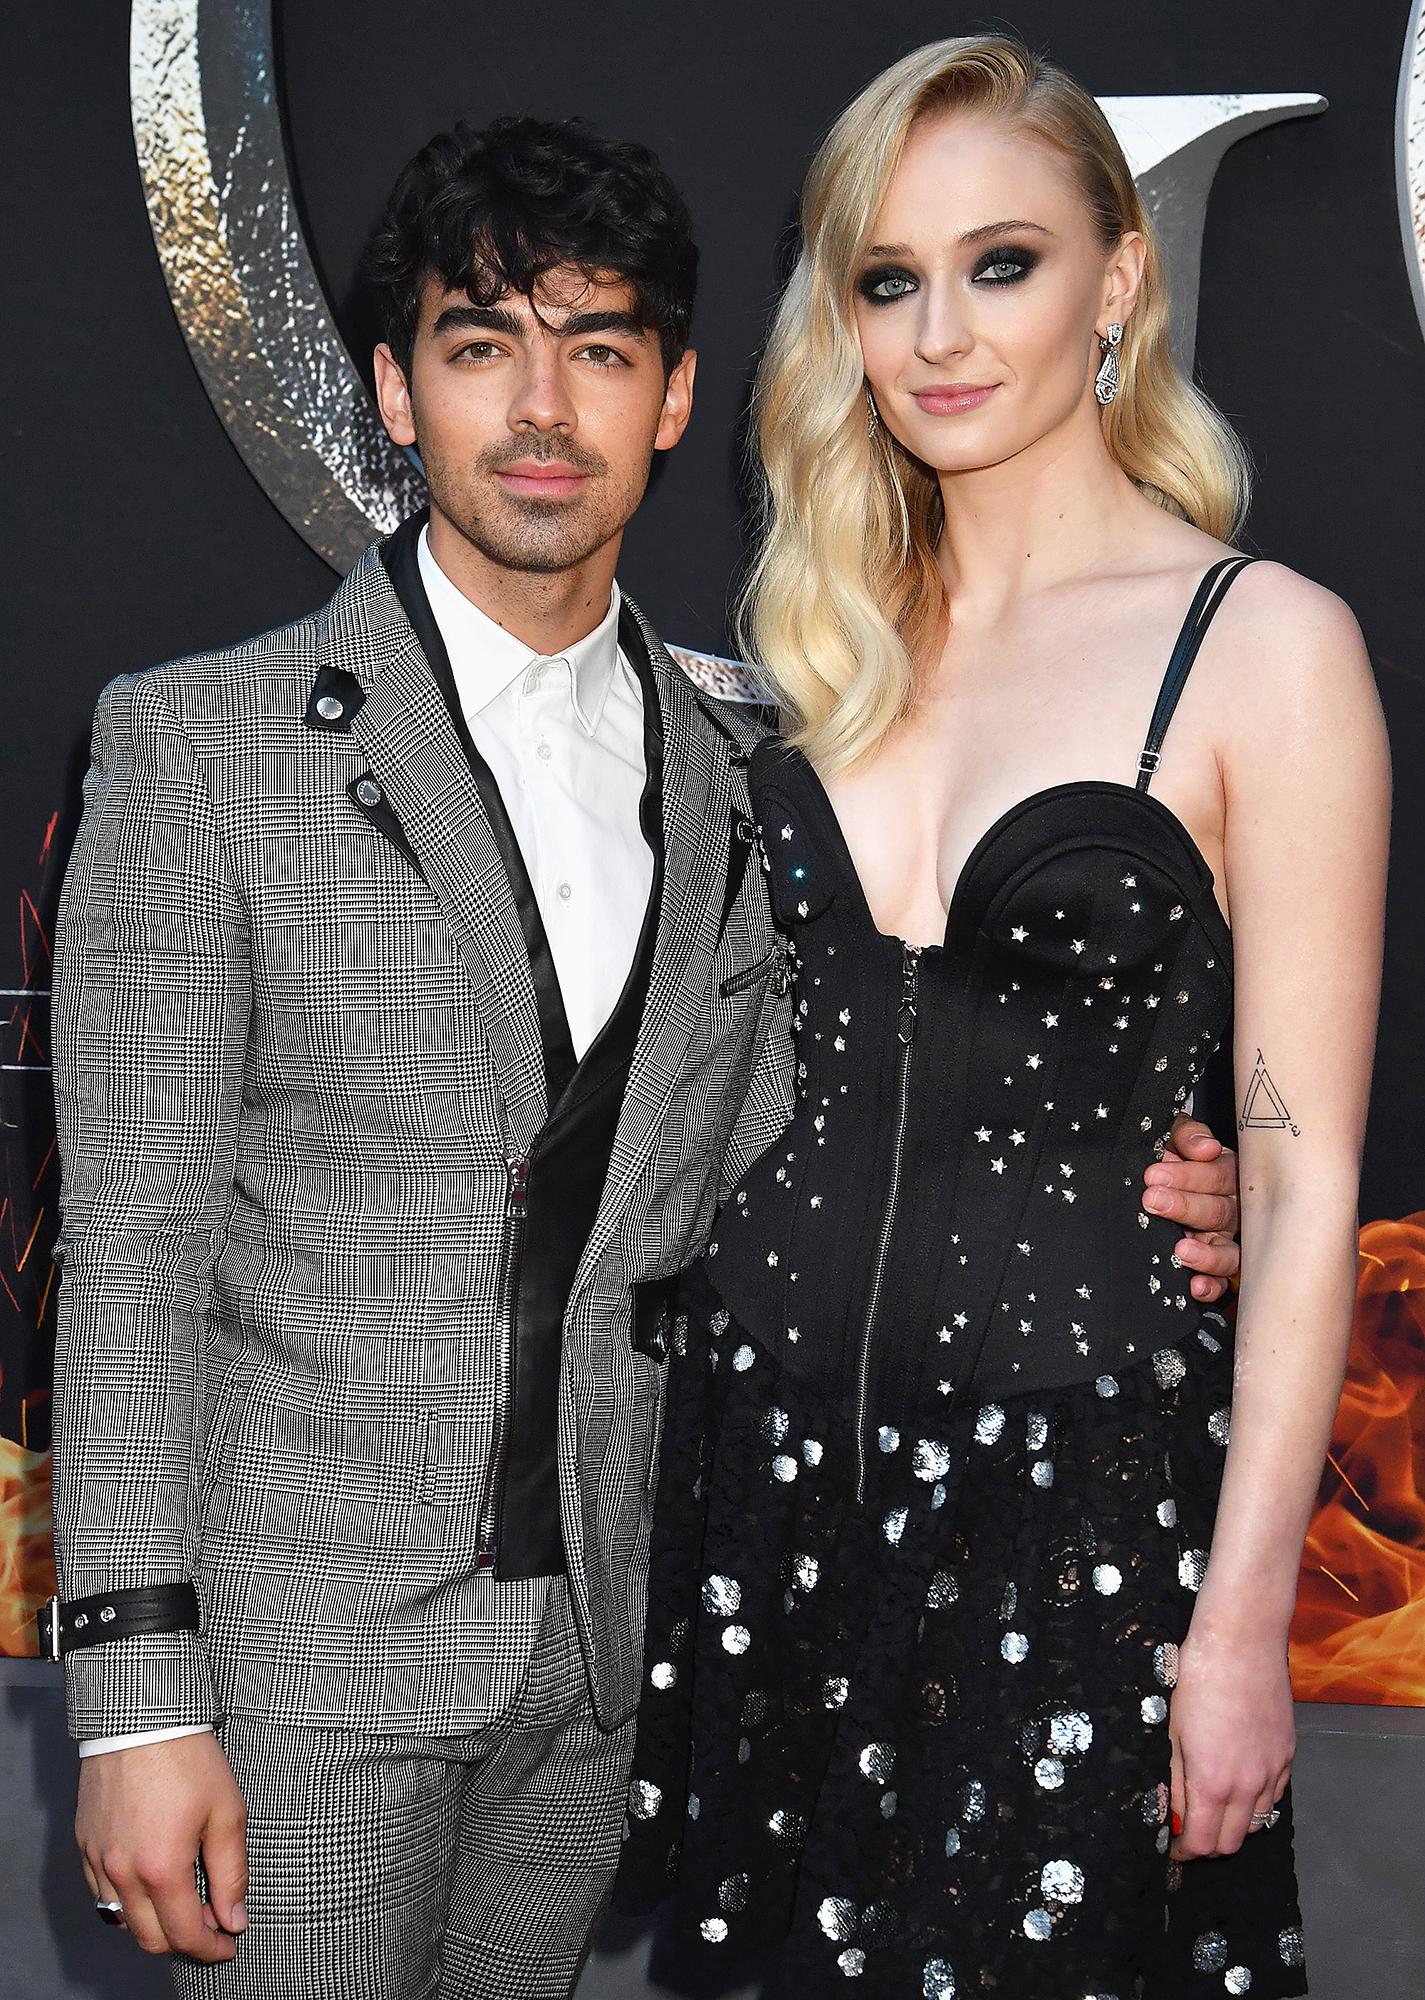 Sophie Turner Joe Jonas Daddy - Joe Jonas and Sophie Turner attend the Game Of Thrones Season 8 NY Premiere on April 3, 2019 in New York City.